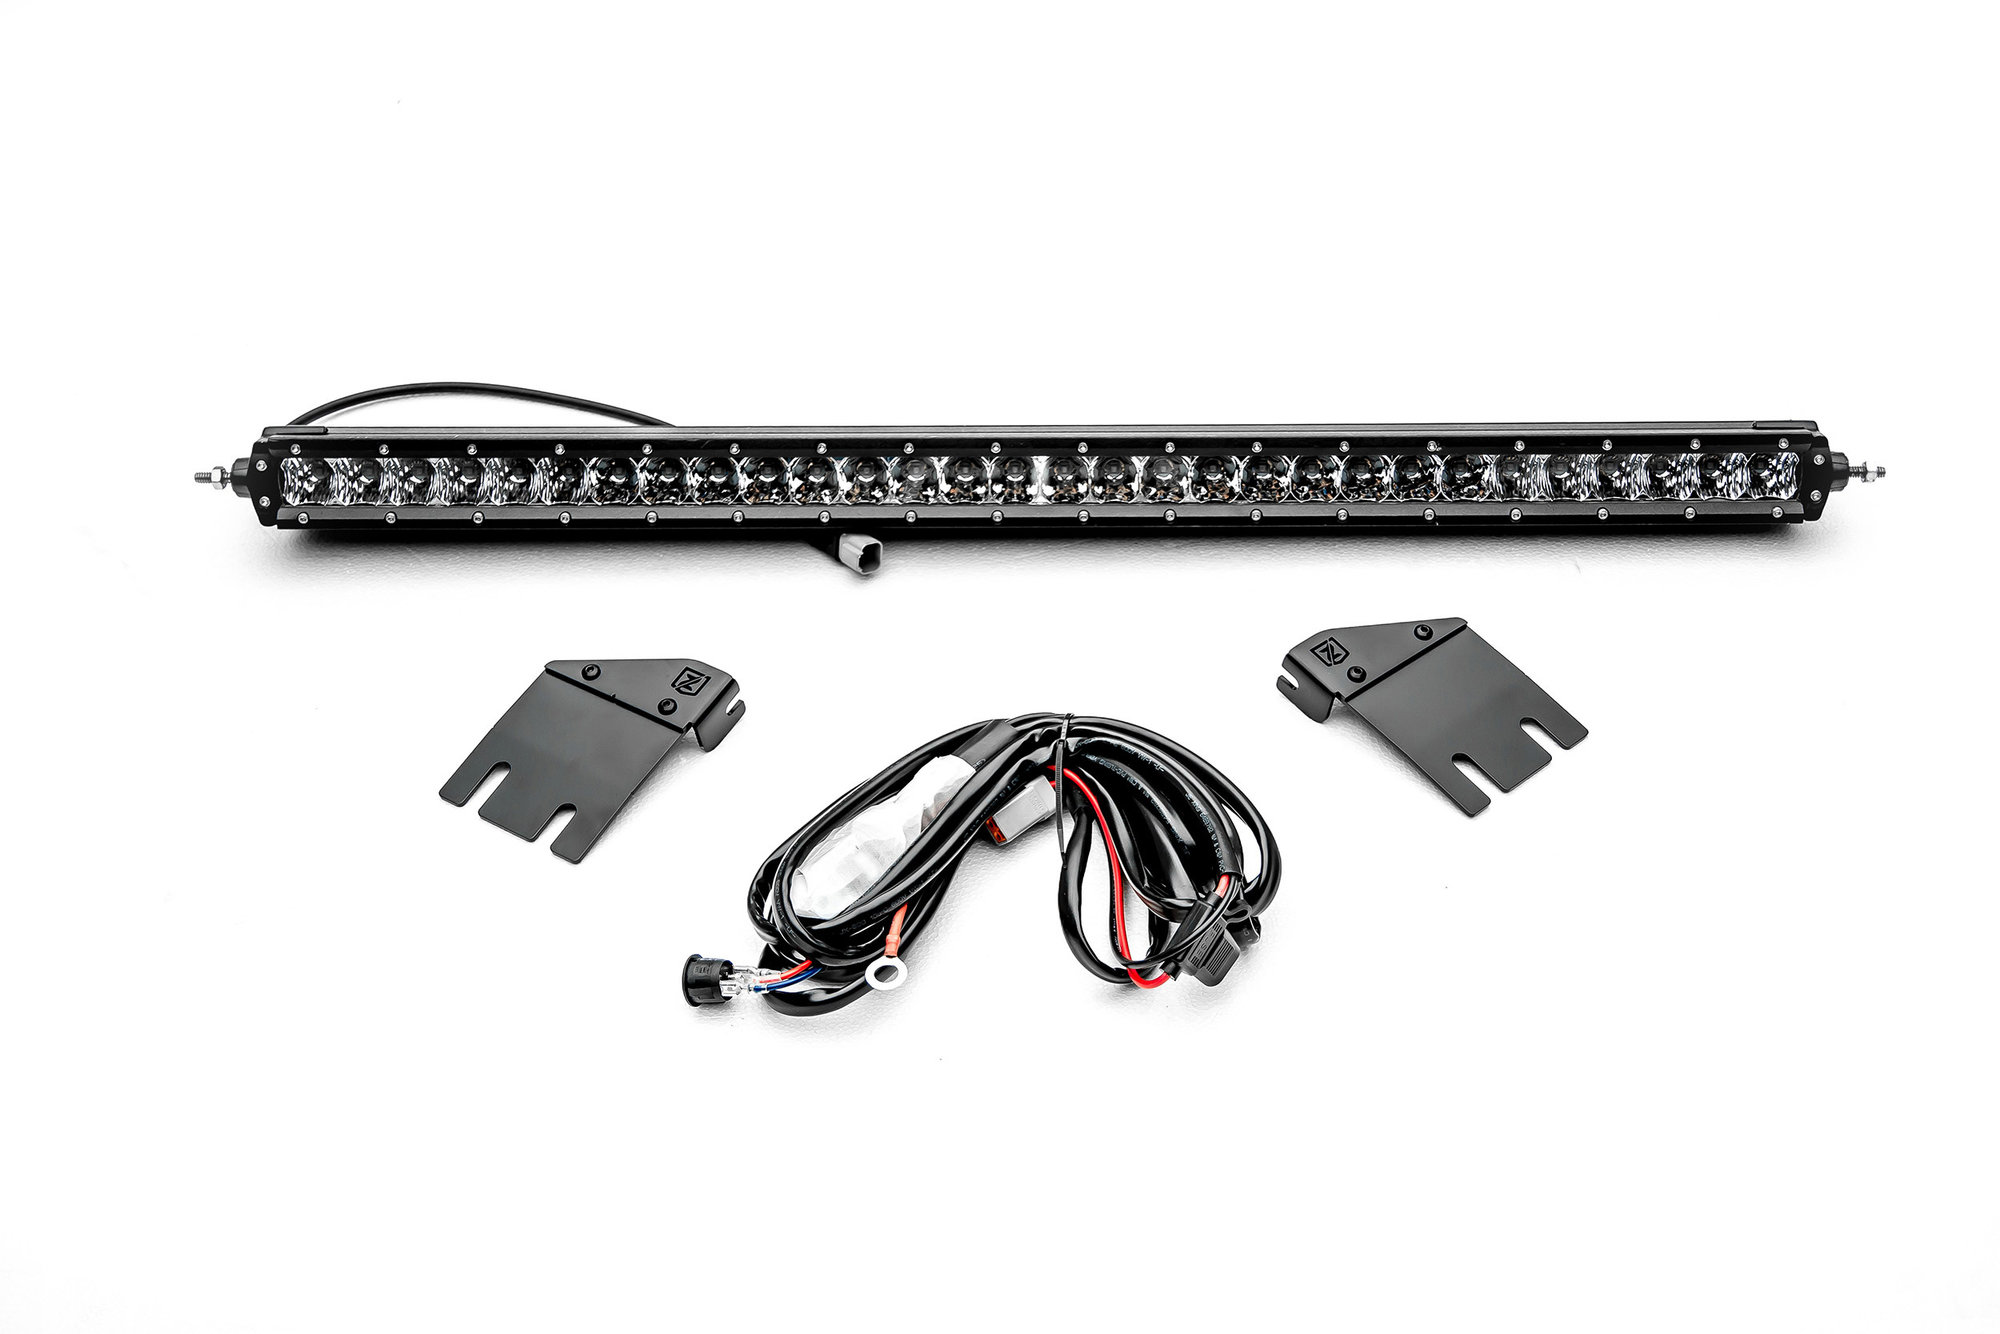 hight resolution of zroadz z364931 kit hood cowl mounting brackets with 1 single row 30 led light bar for 18 19 jeep wrangler jl quadratec